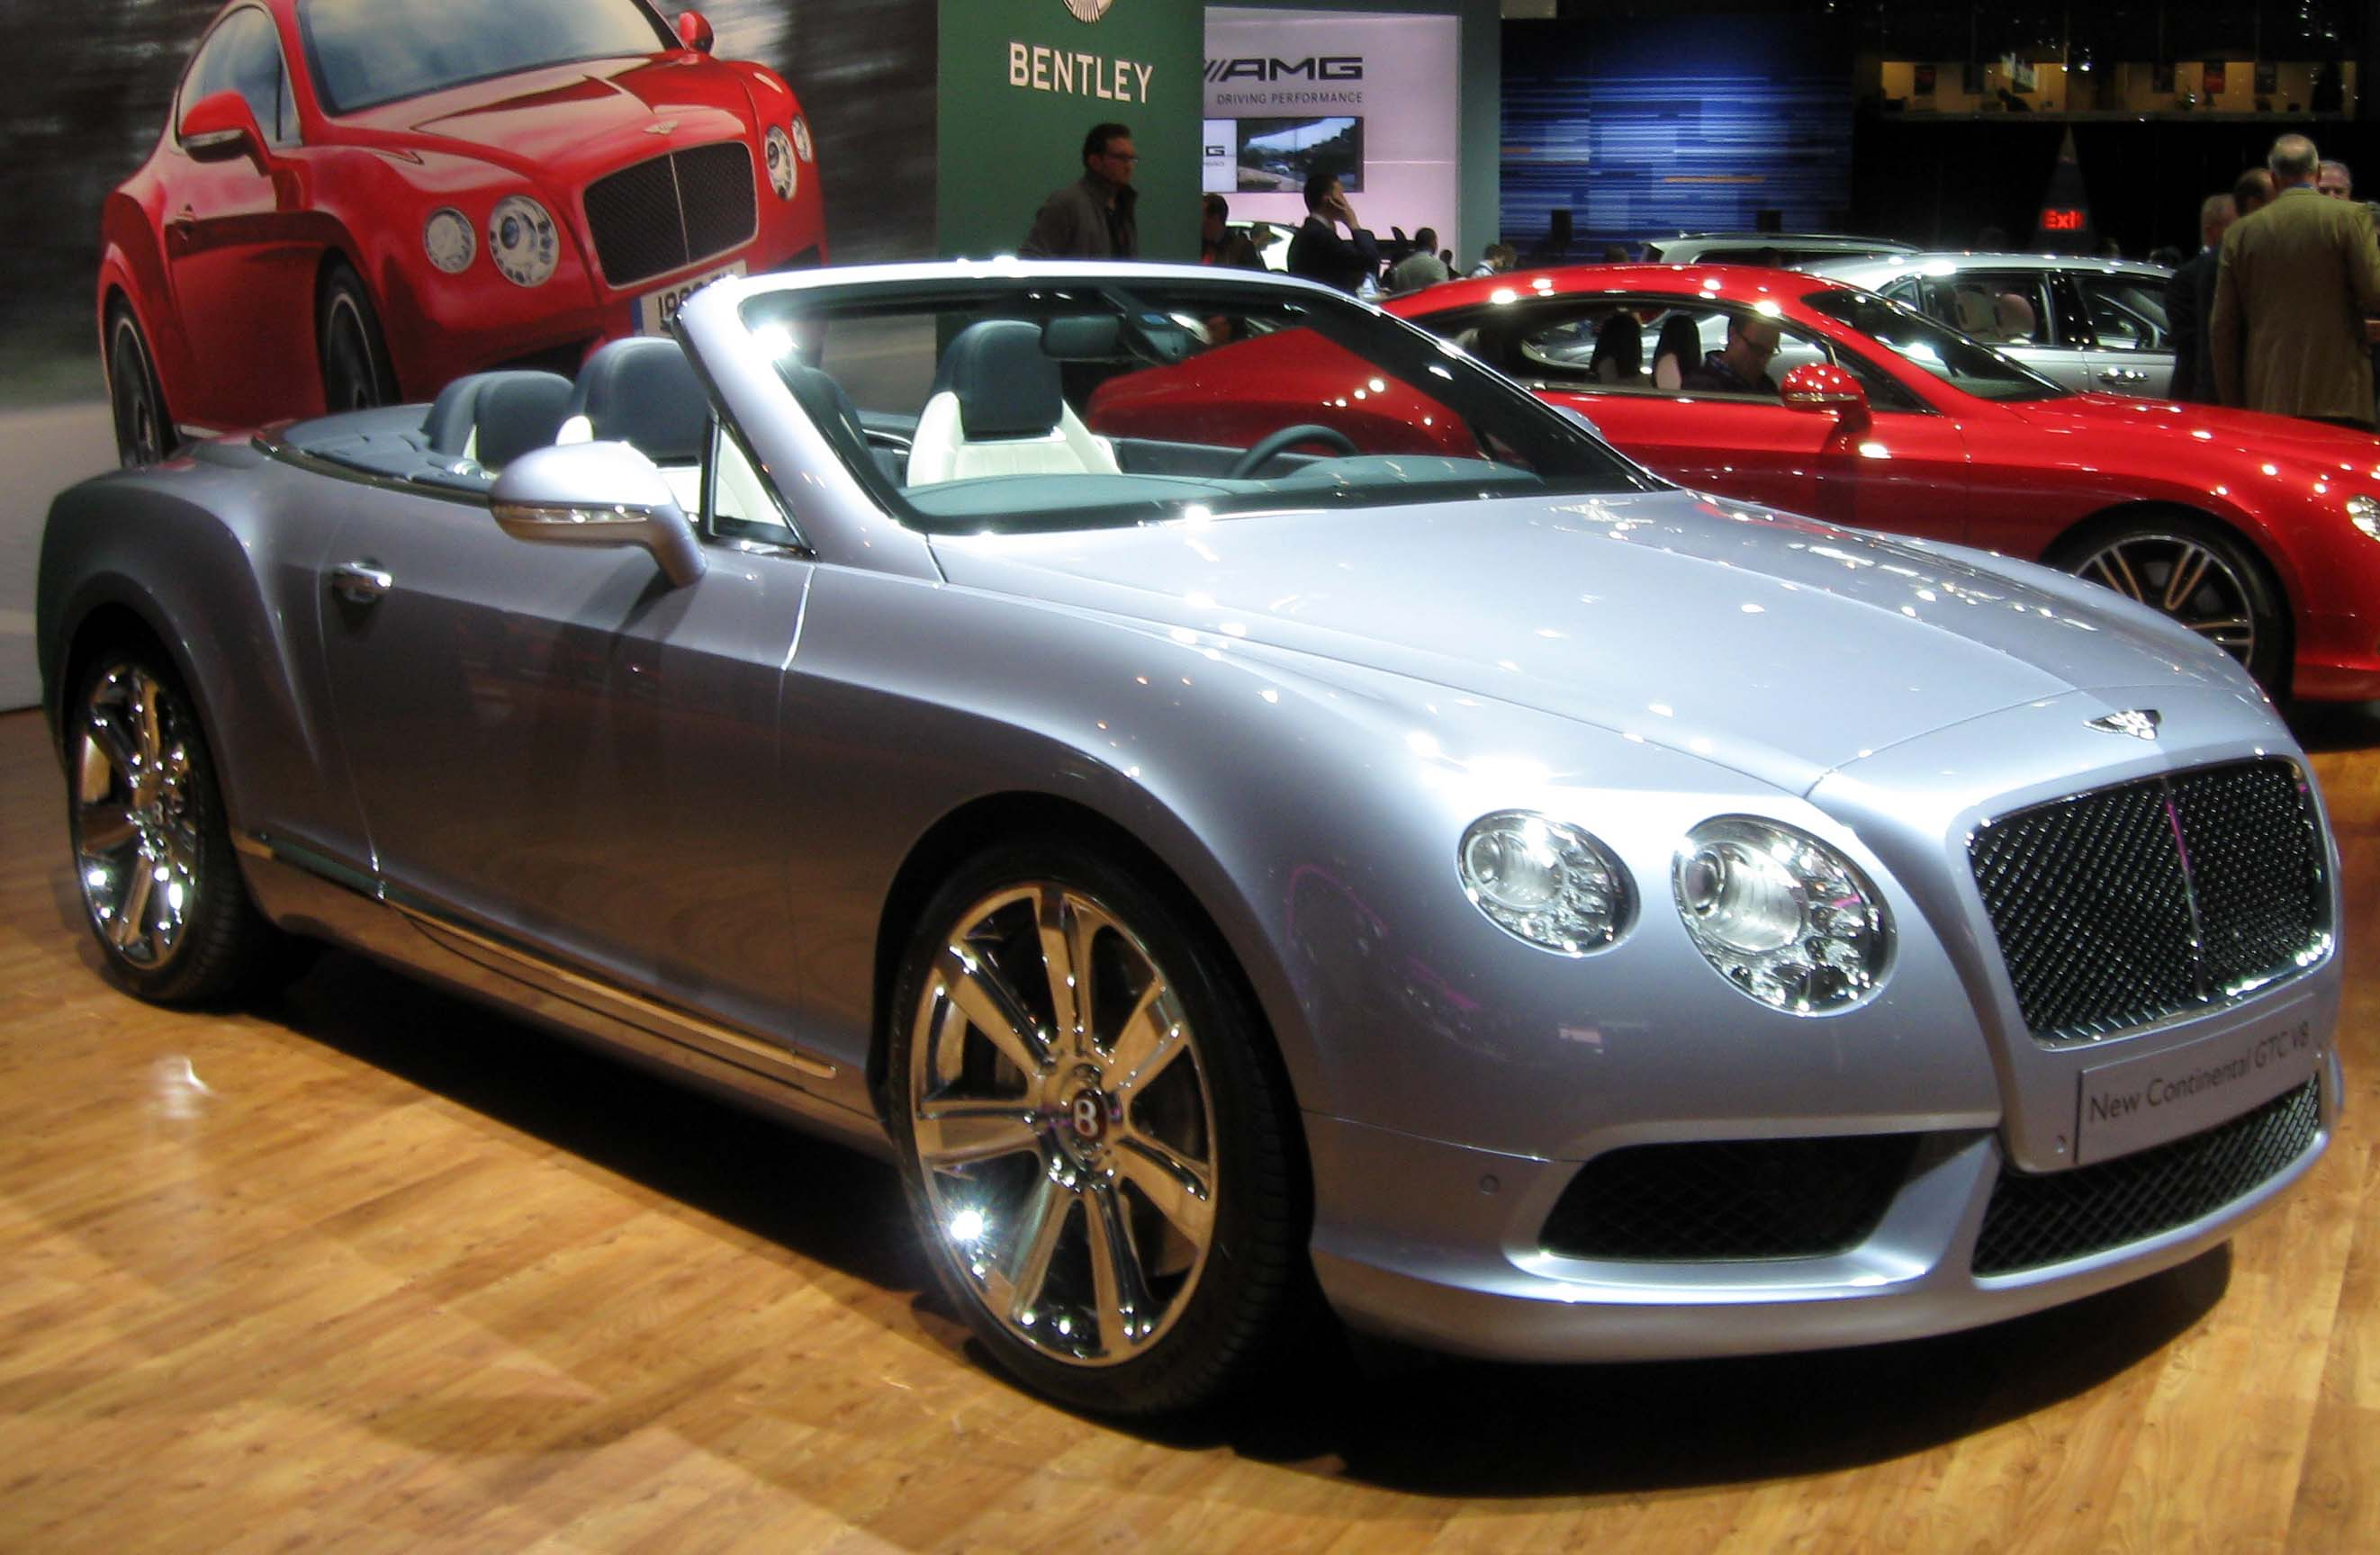 File:2013 Bentley Continental GTC -- 2012 NYIAS.JPG - Wikipedia, the ...